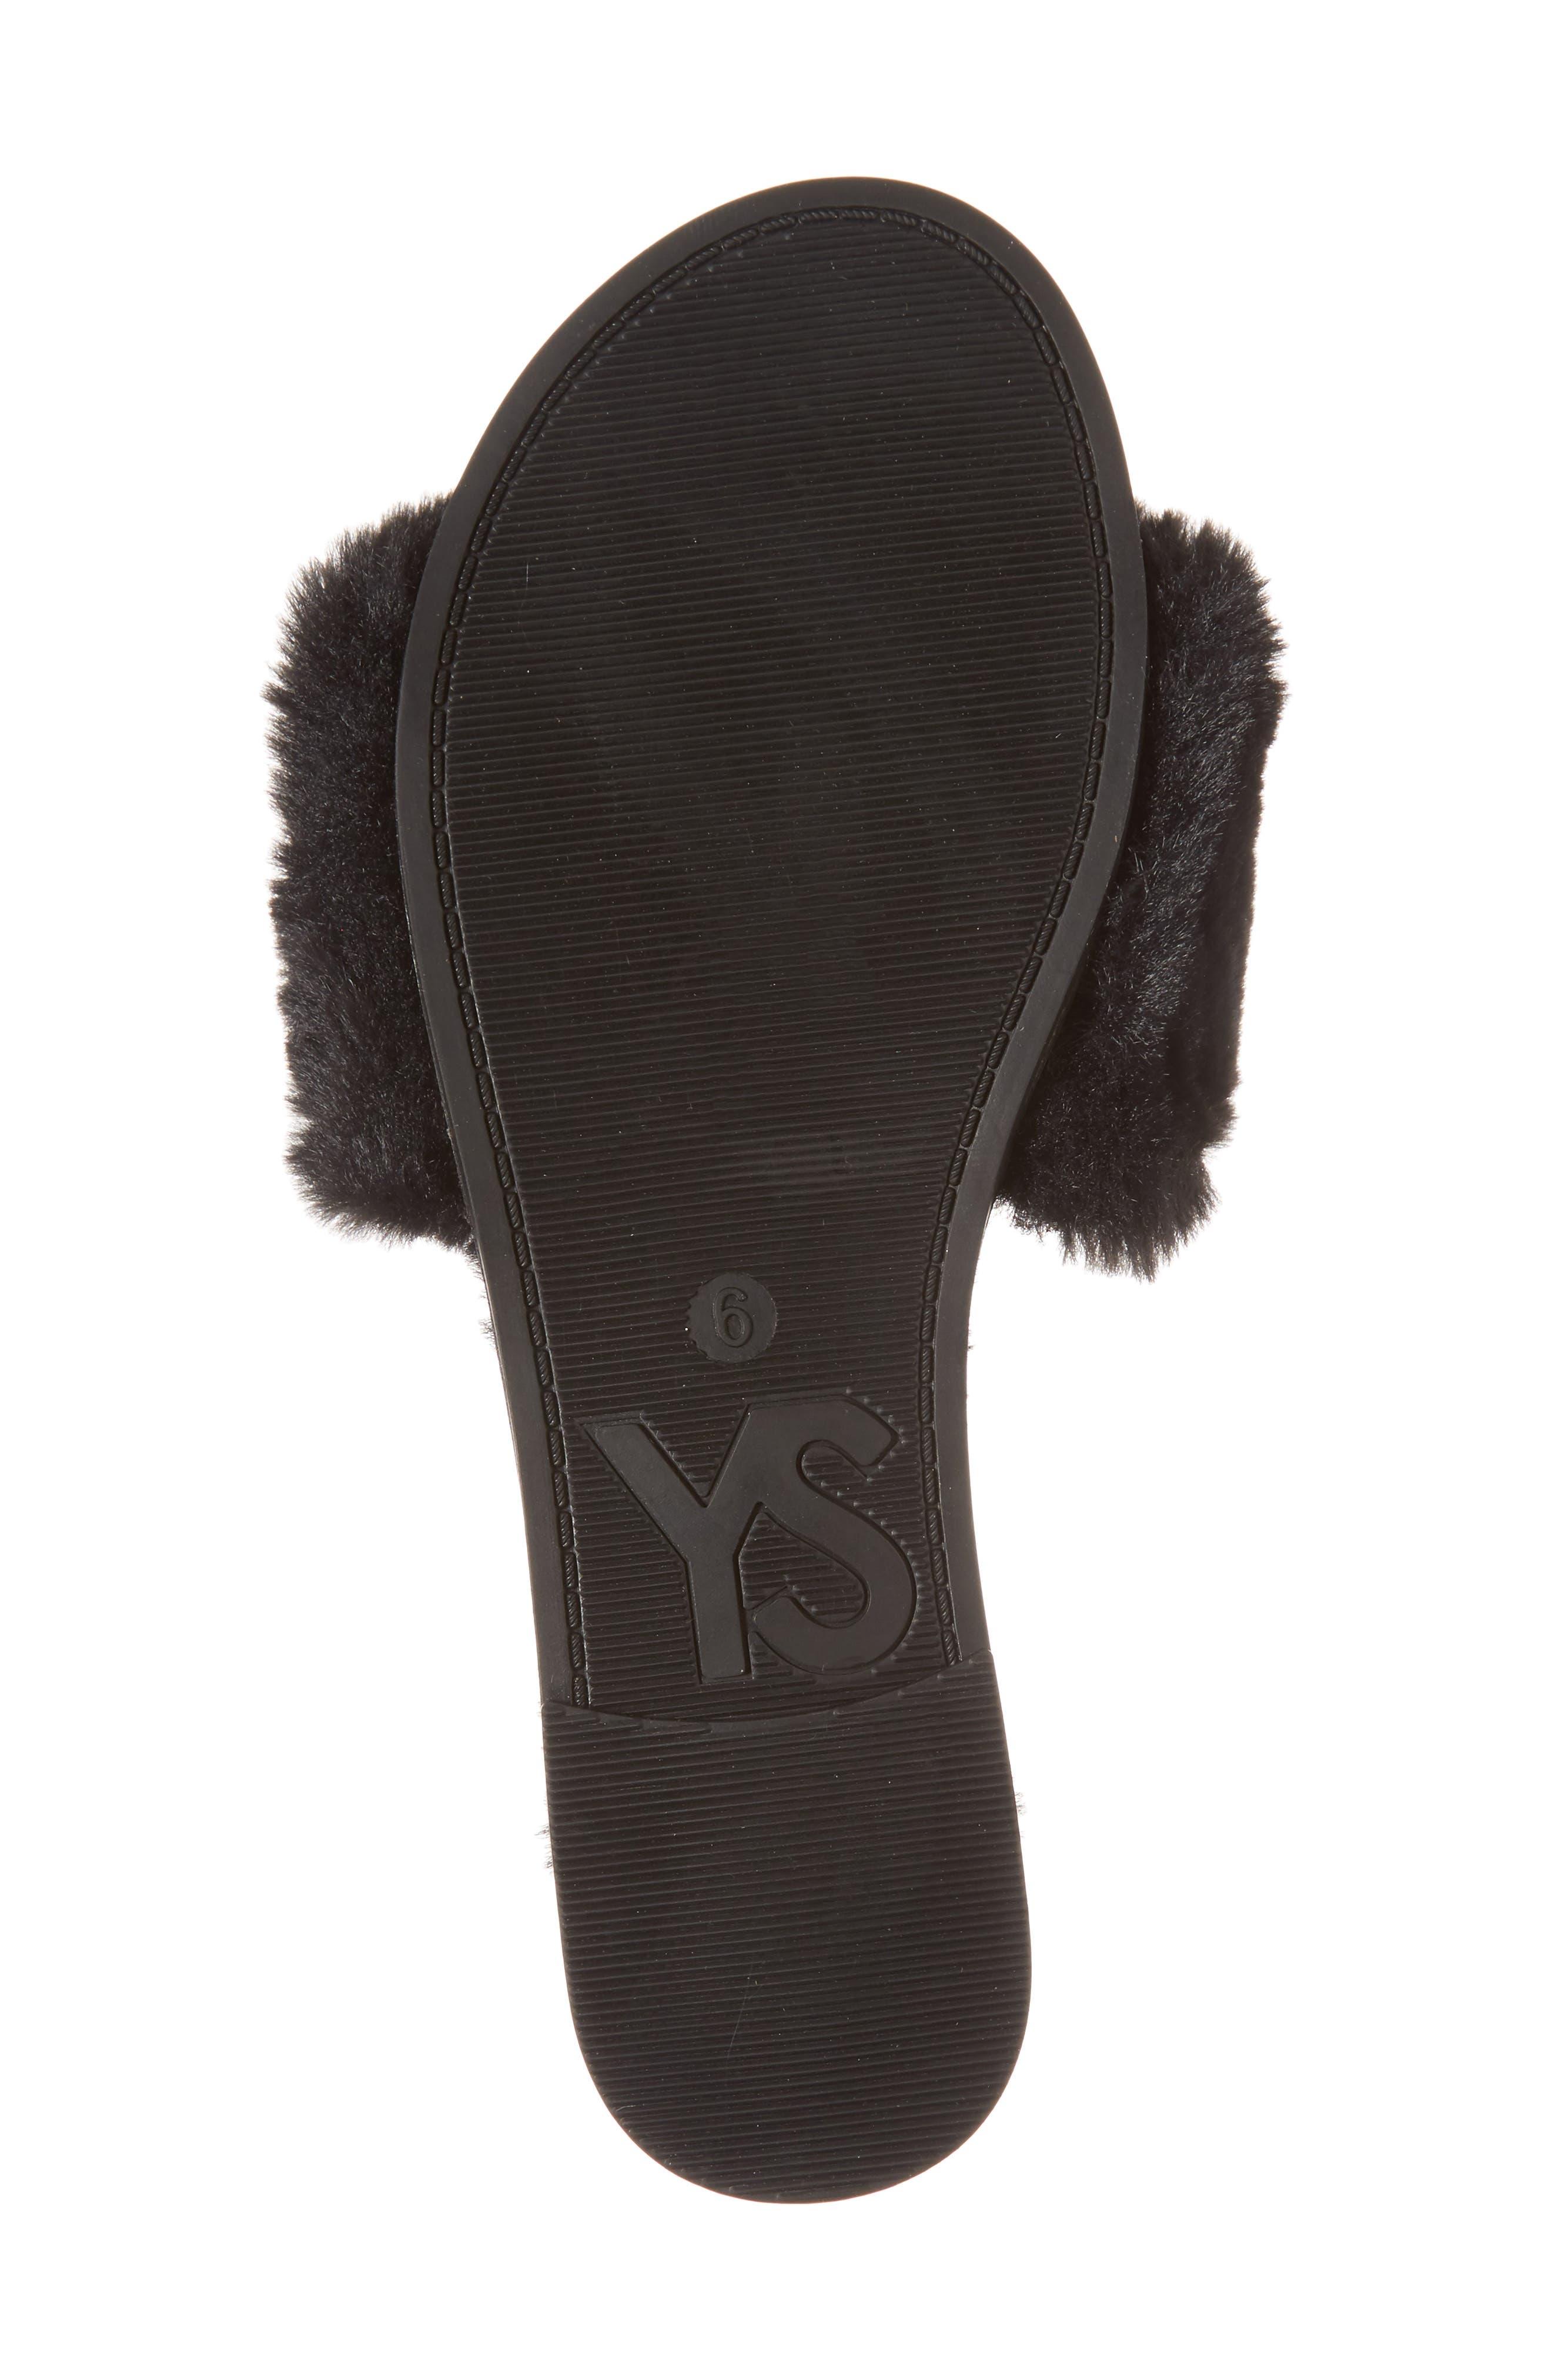 Rose Faux Fur Slide Sandal,                             Alternate thumbnail 6, color,                             BLACK FAUX FUR